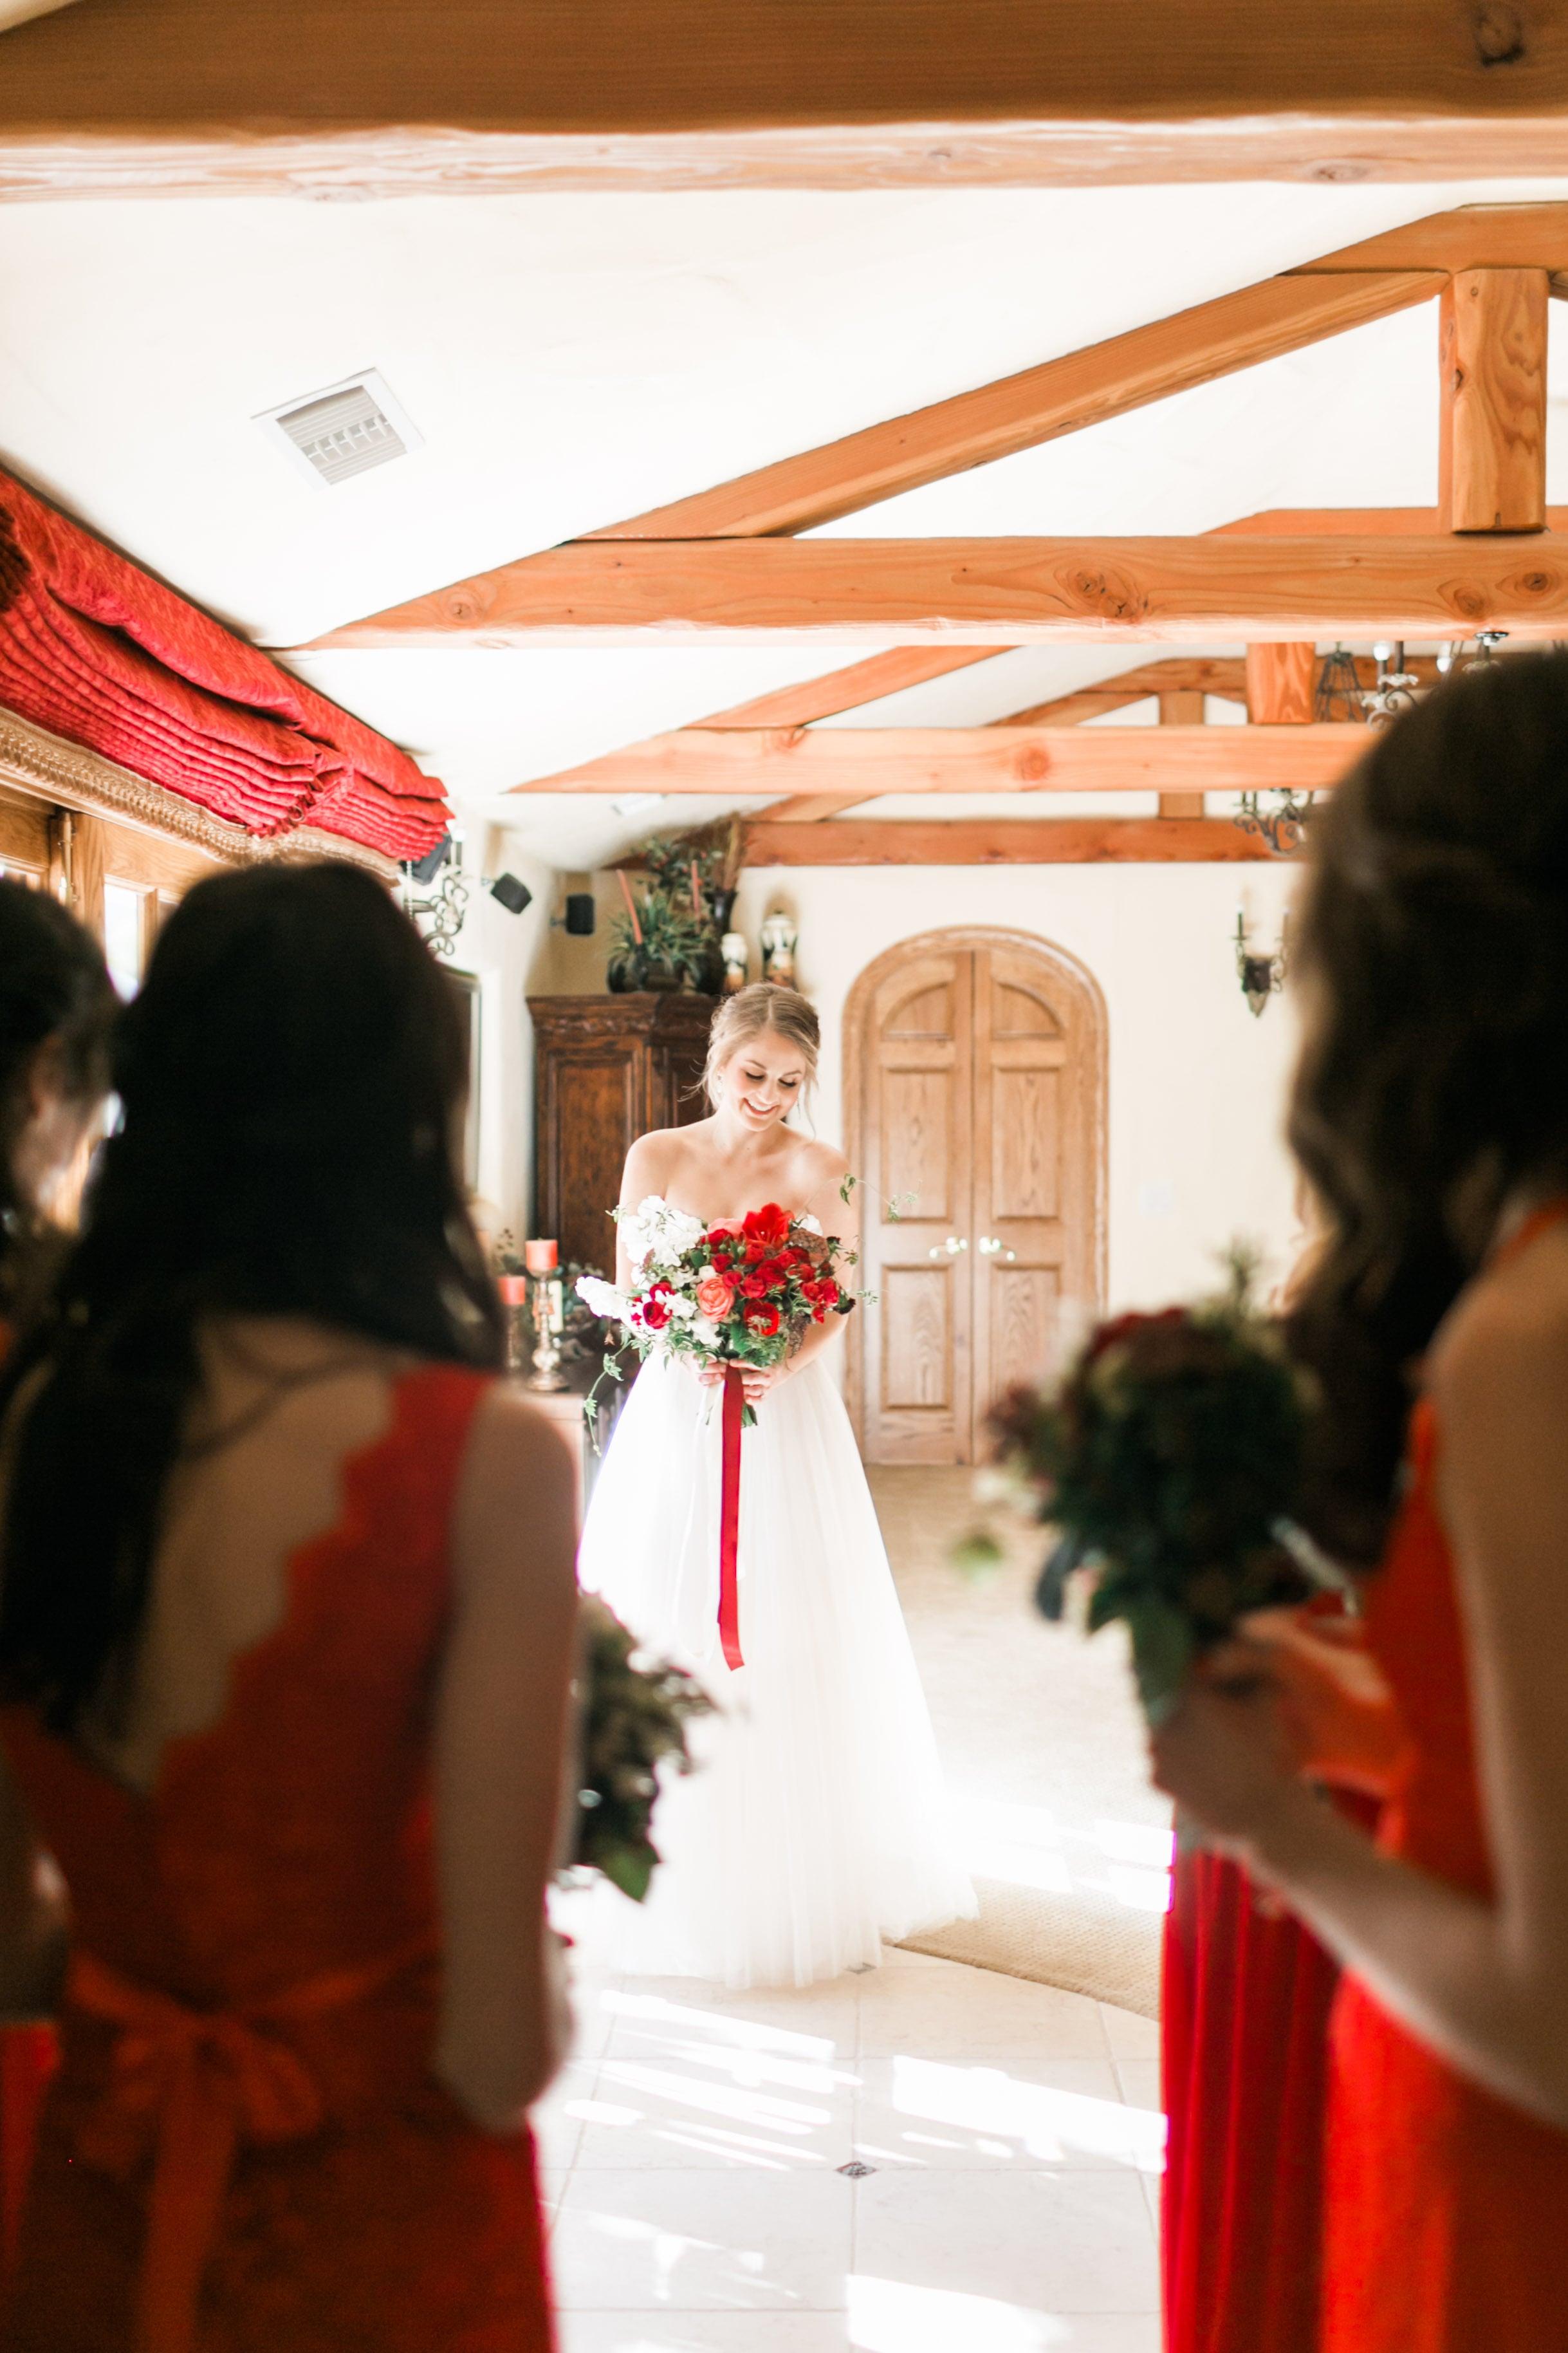 Natalie_Schutt_Photography_Winter_Wedding_San_Luis_Obispo-43.jpg